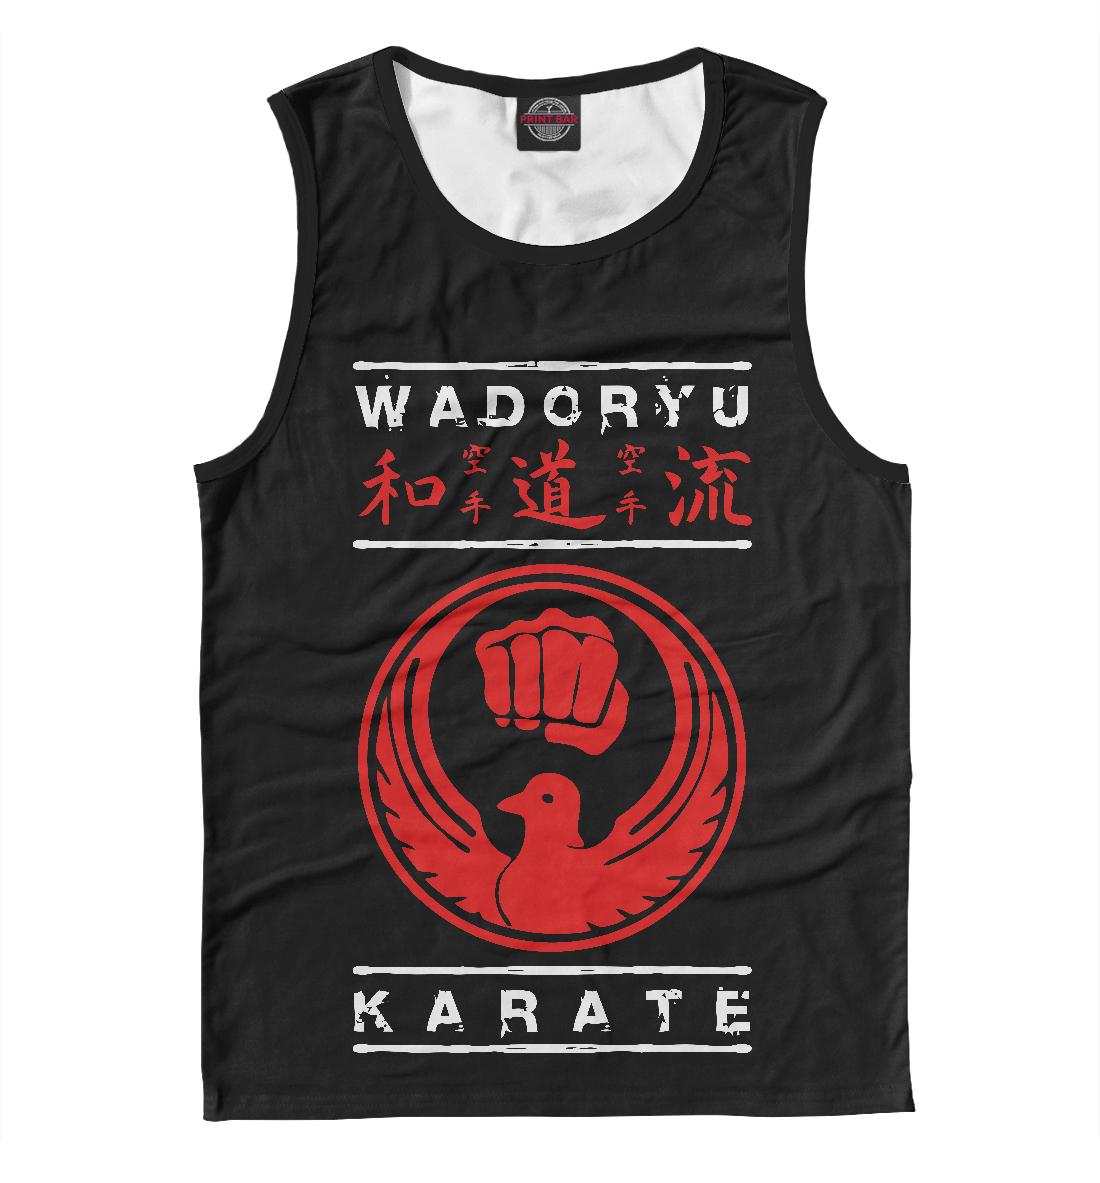 Купить Wadoryu Karate, Printbar, Майки, EDI-612055-may-2